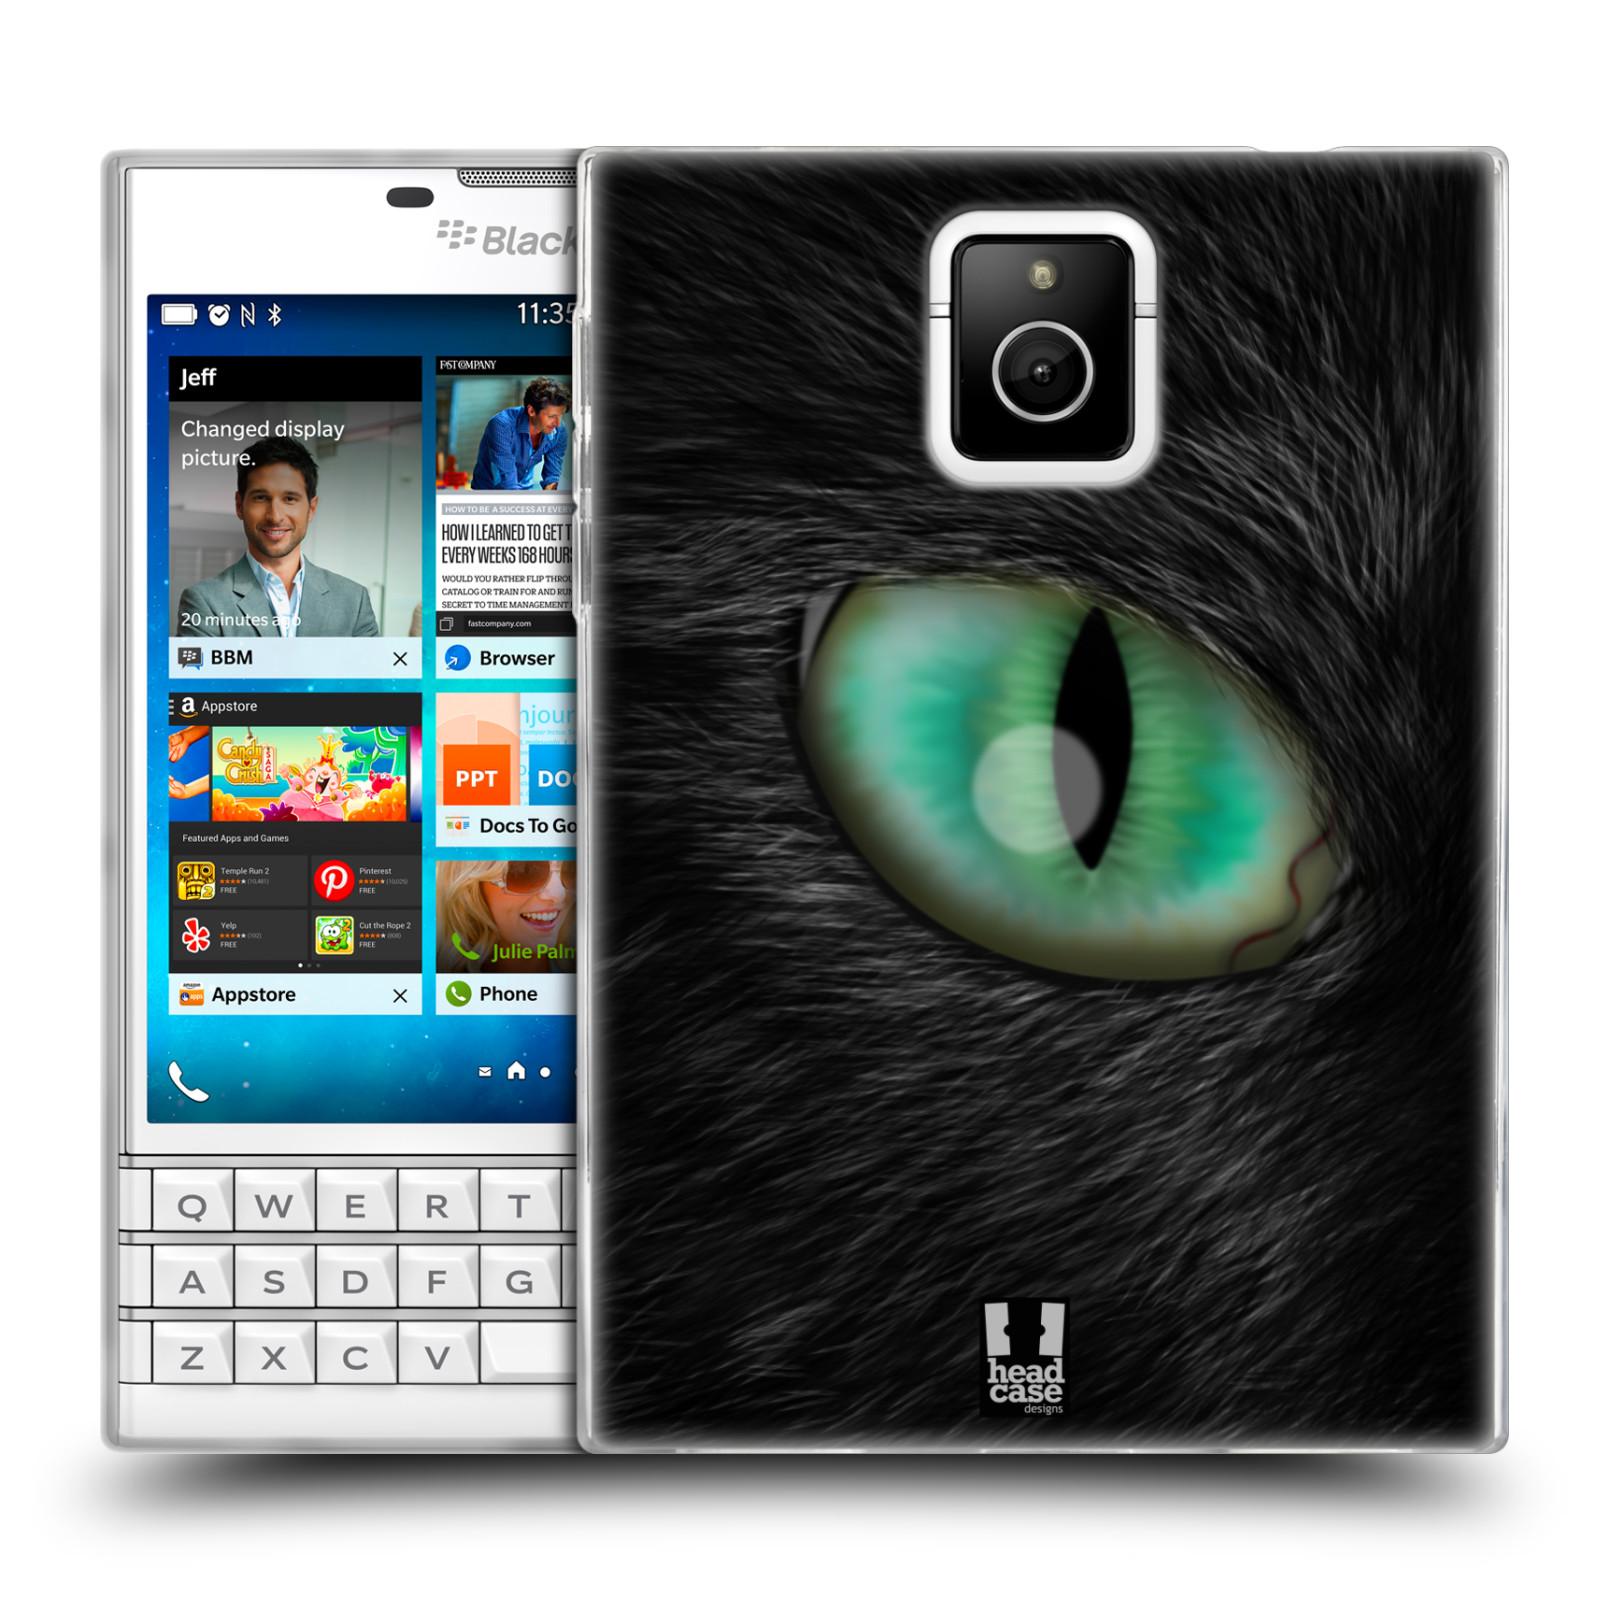 HEAD CASE silikonový obal na mobil Blackberry PASSPORT vzor pohled zvířete oko kočka